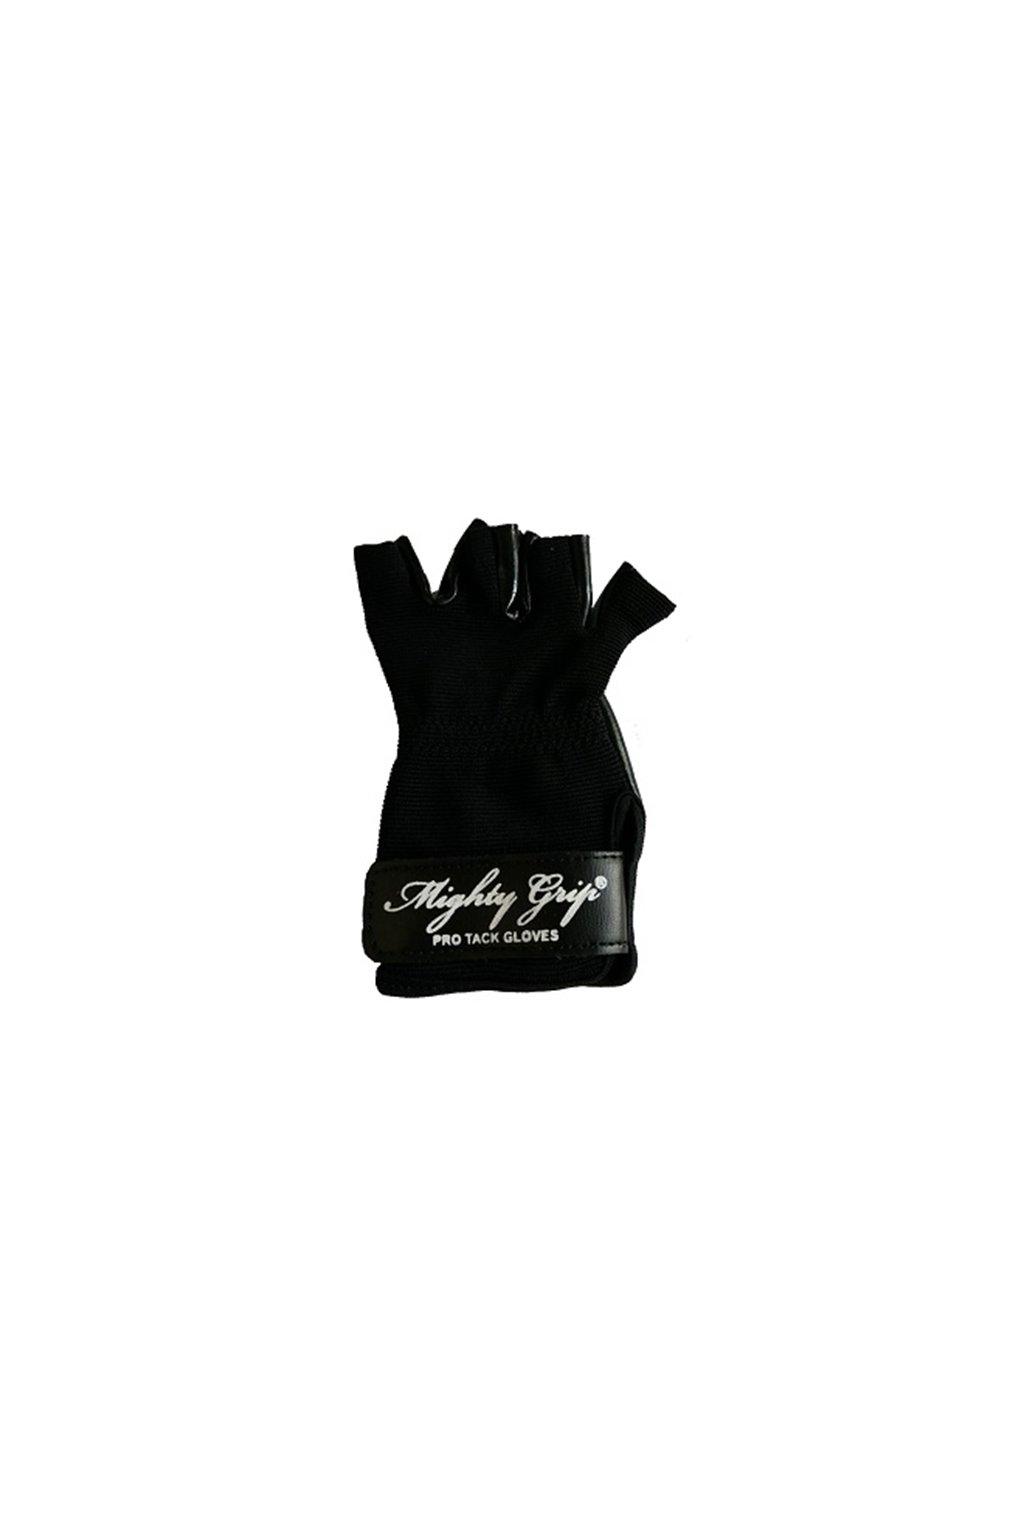 227 0 Mighty Grip gloves pro tack black sm